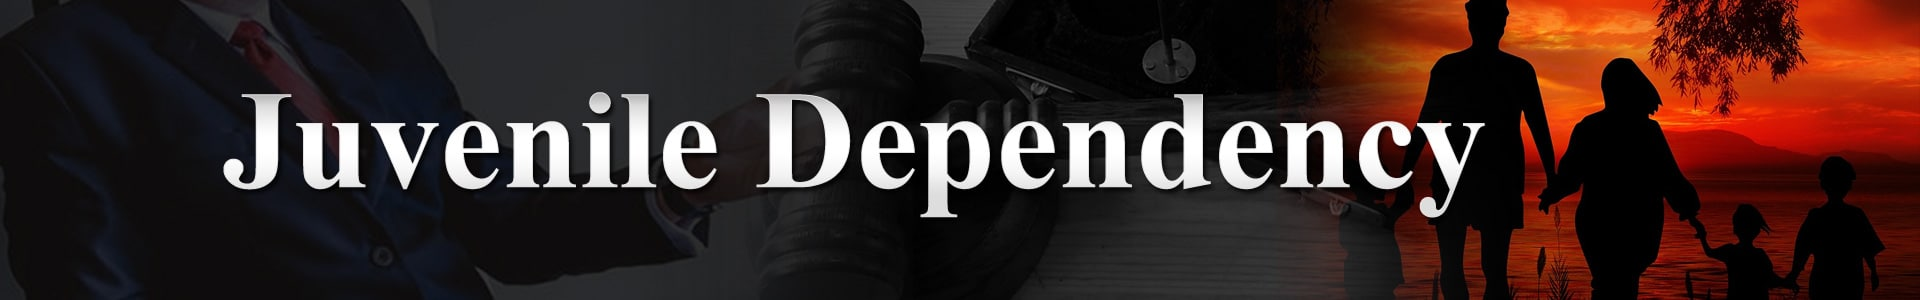 Juvenile-Dependency